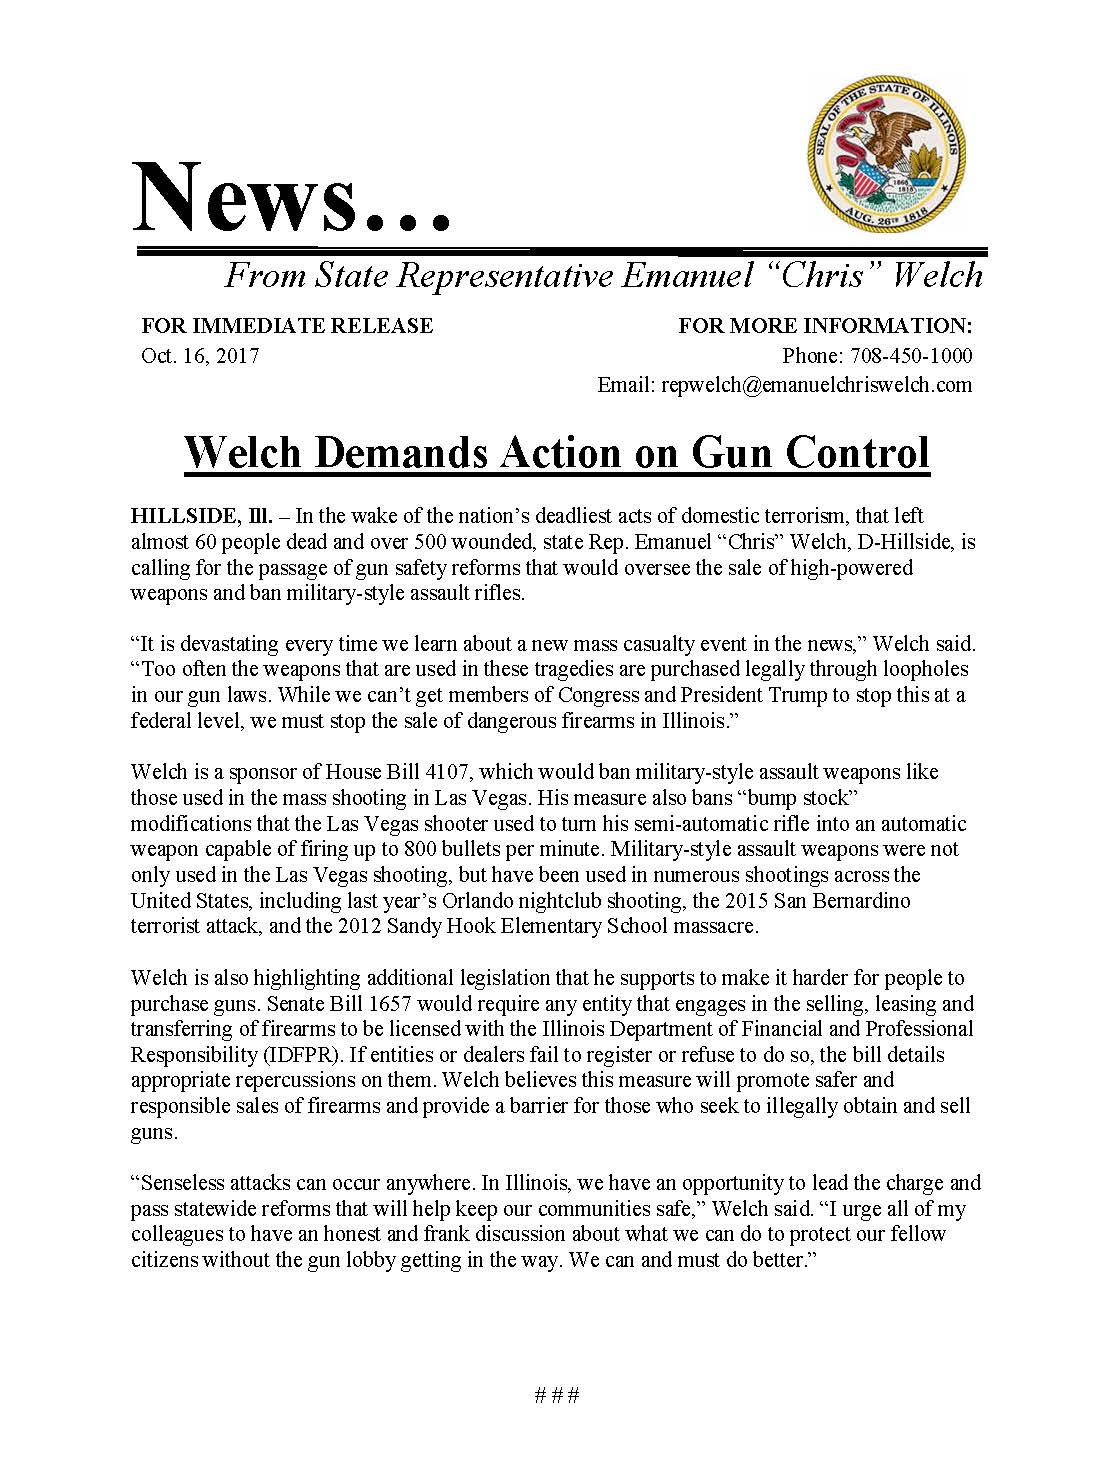 Welch Demands Action on Gun Control  (October 16, 2017)